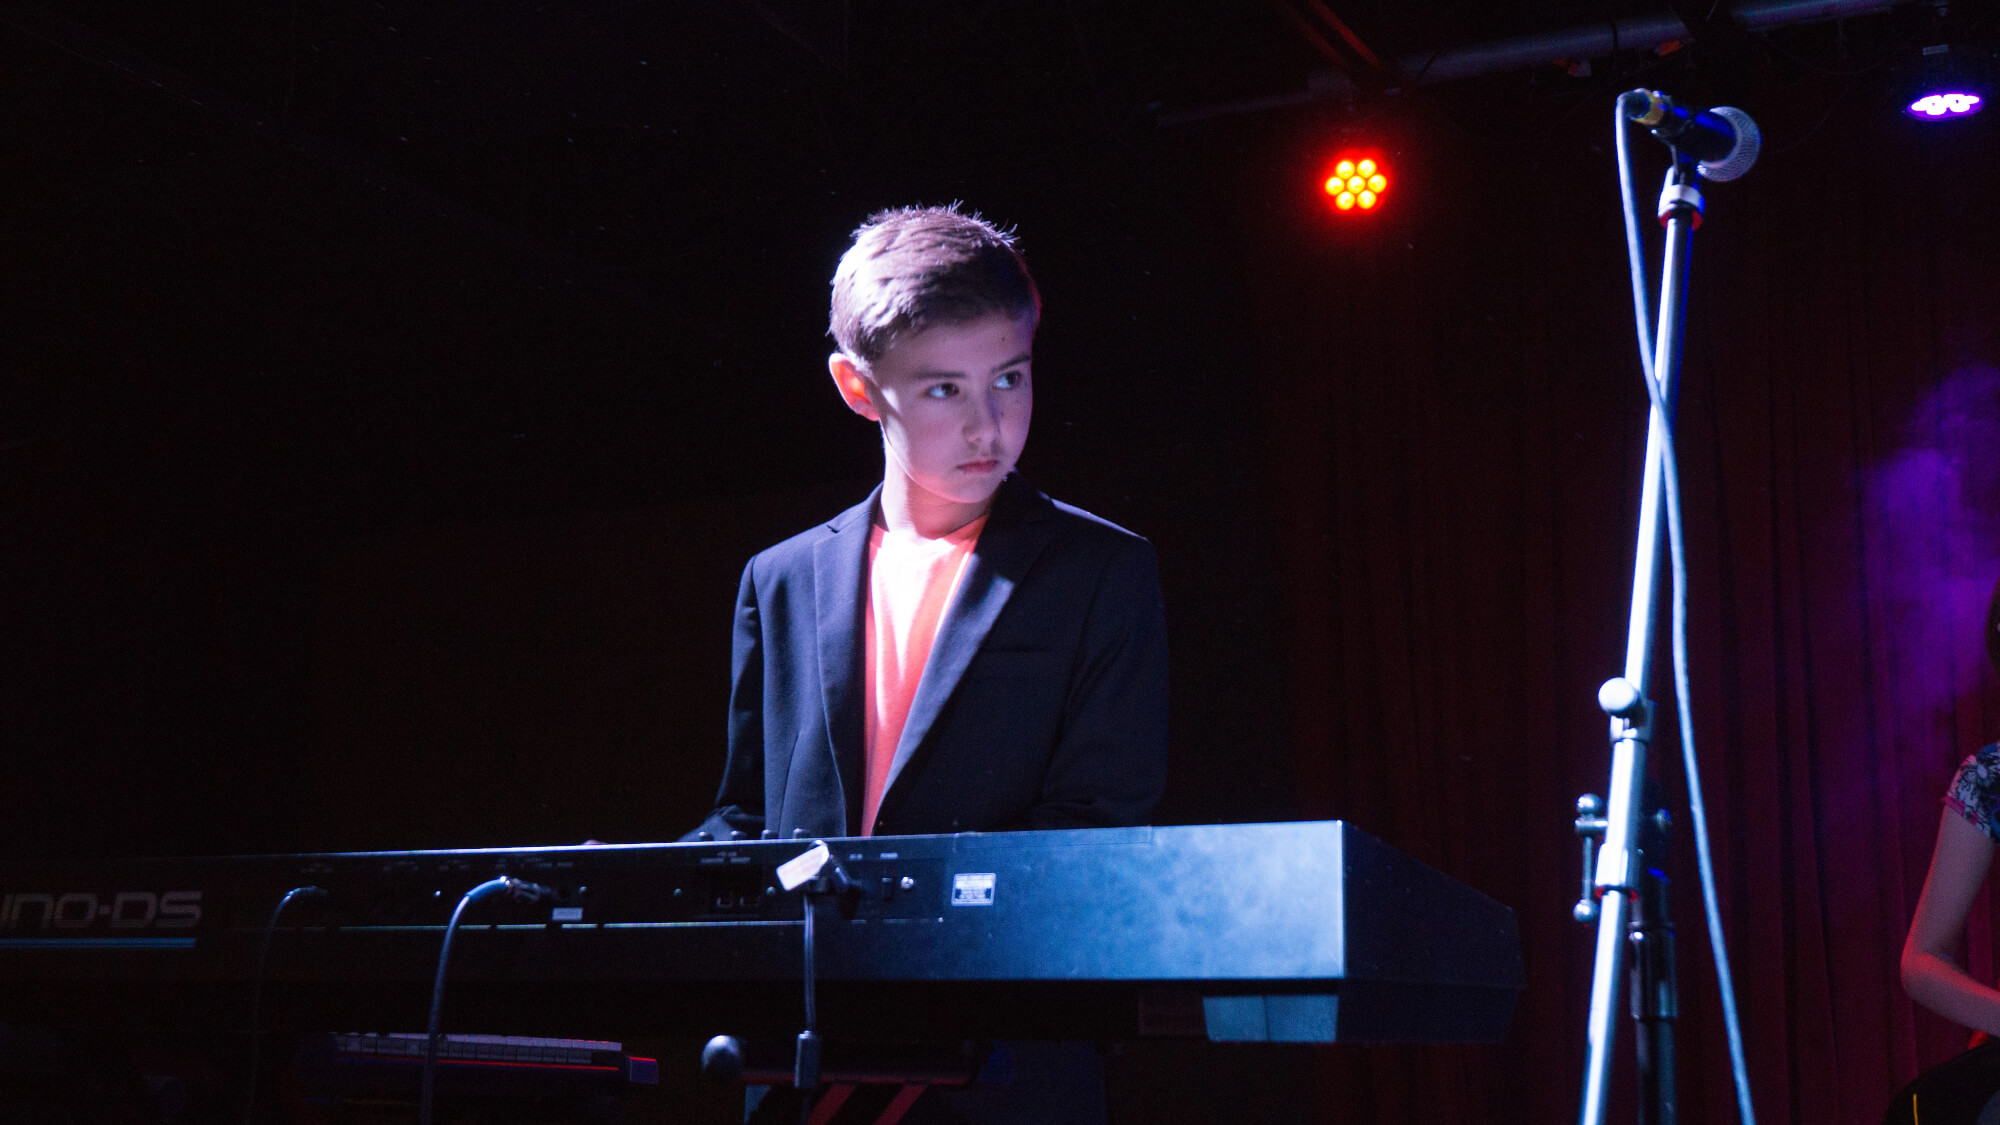 Spring 2018 Live Performance at Firebird.